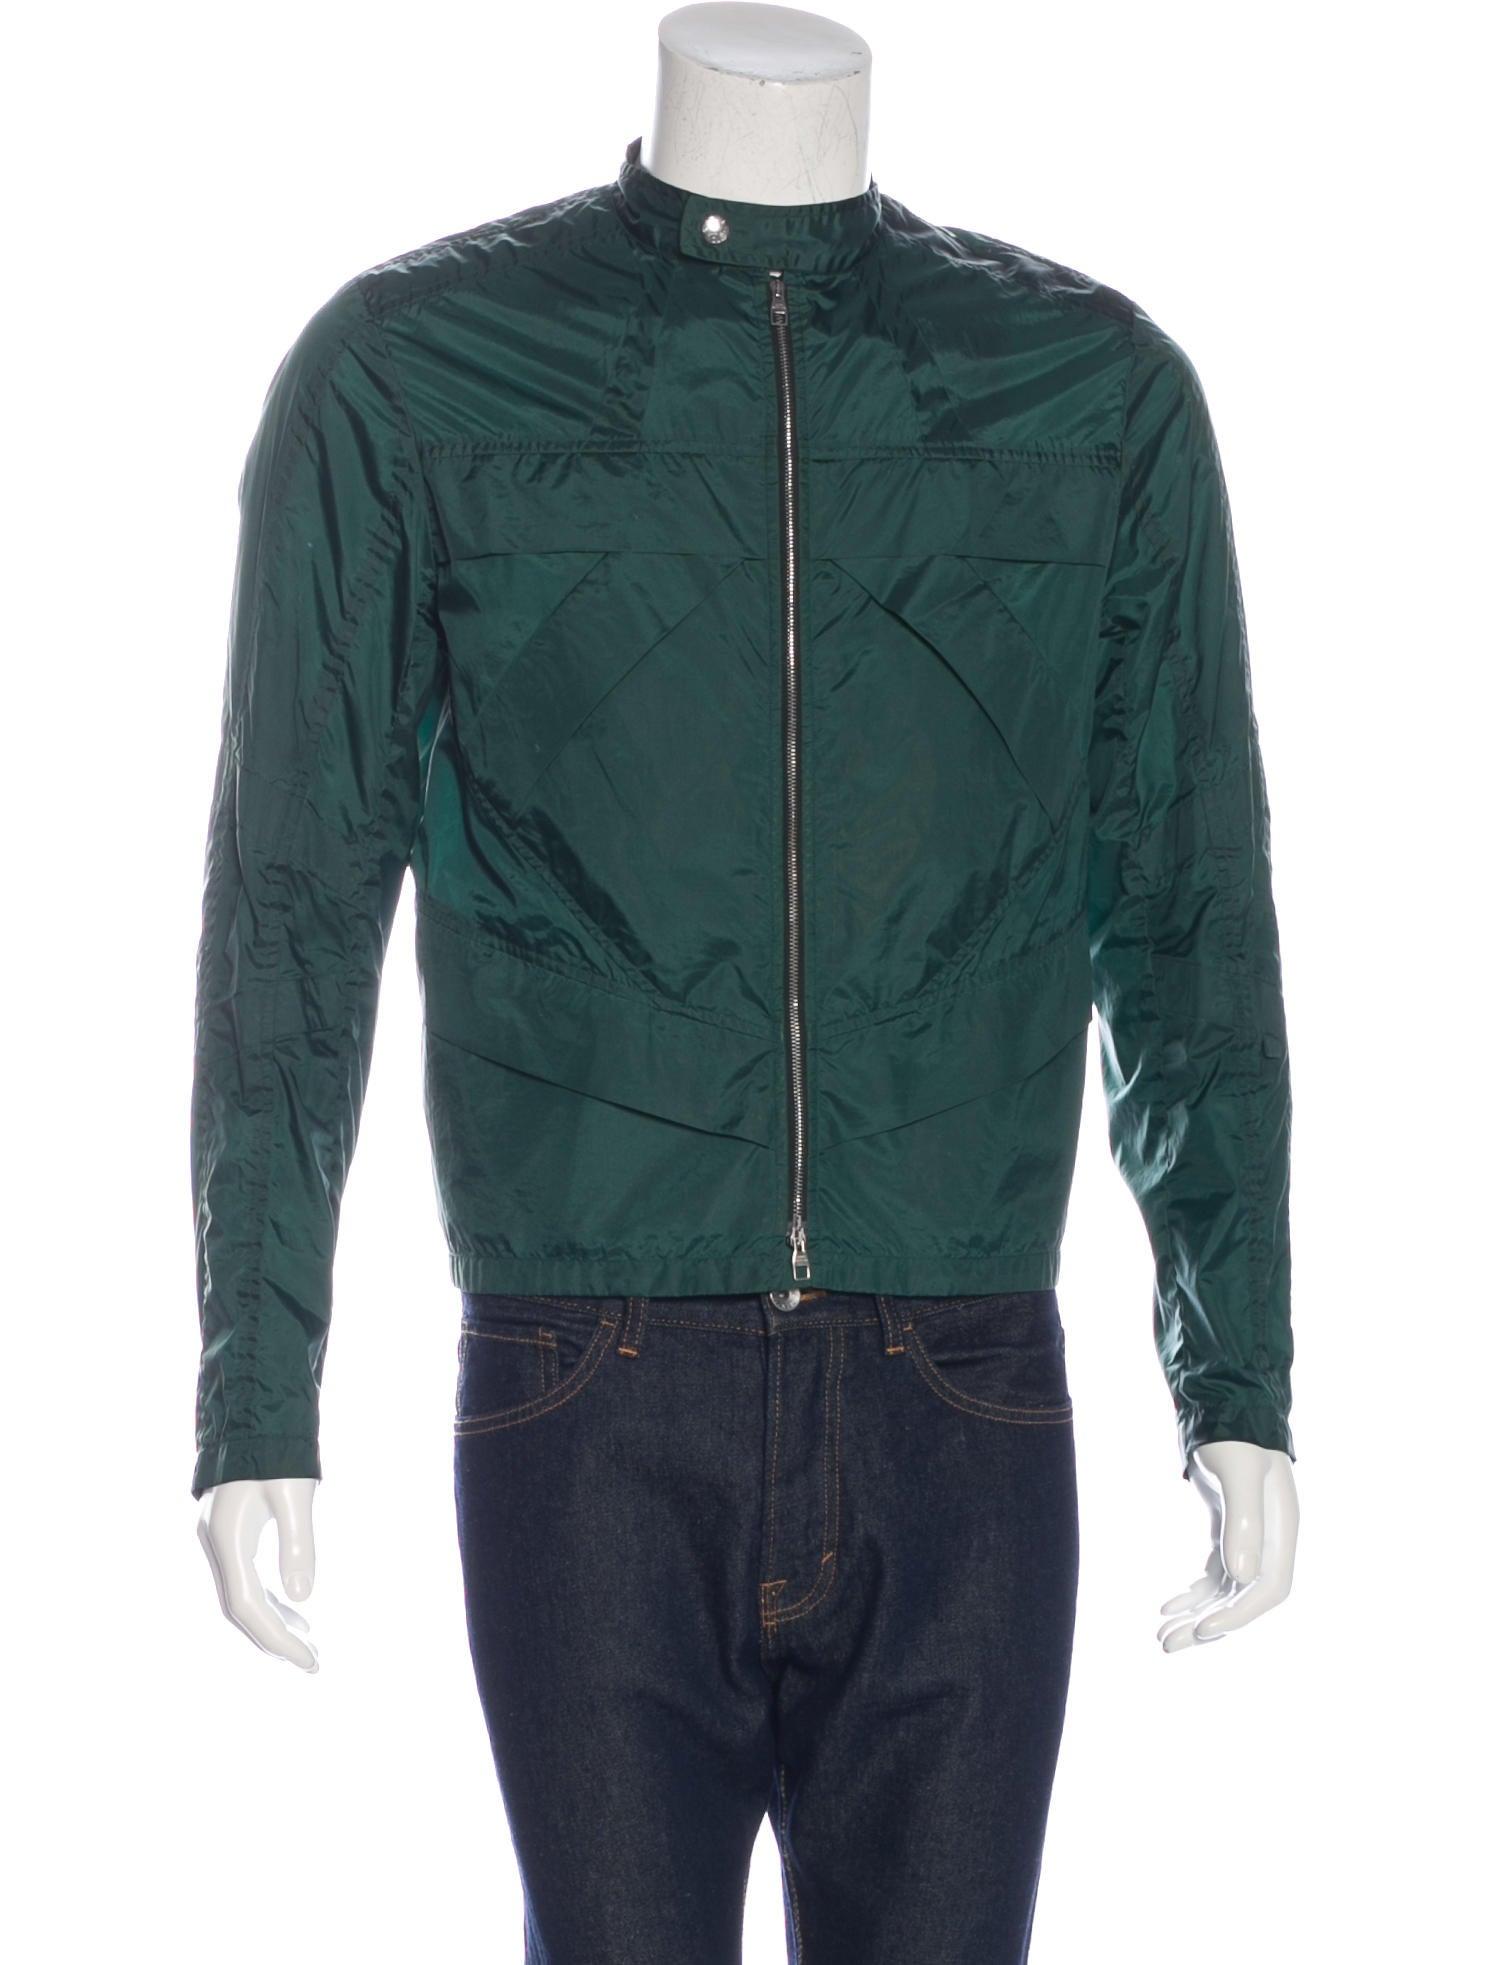 louis vuitton nylon windbreaker jacket clothing. Black Bedroom Furniture Sets. Home Design Ideas